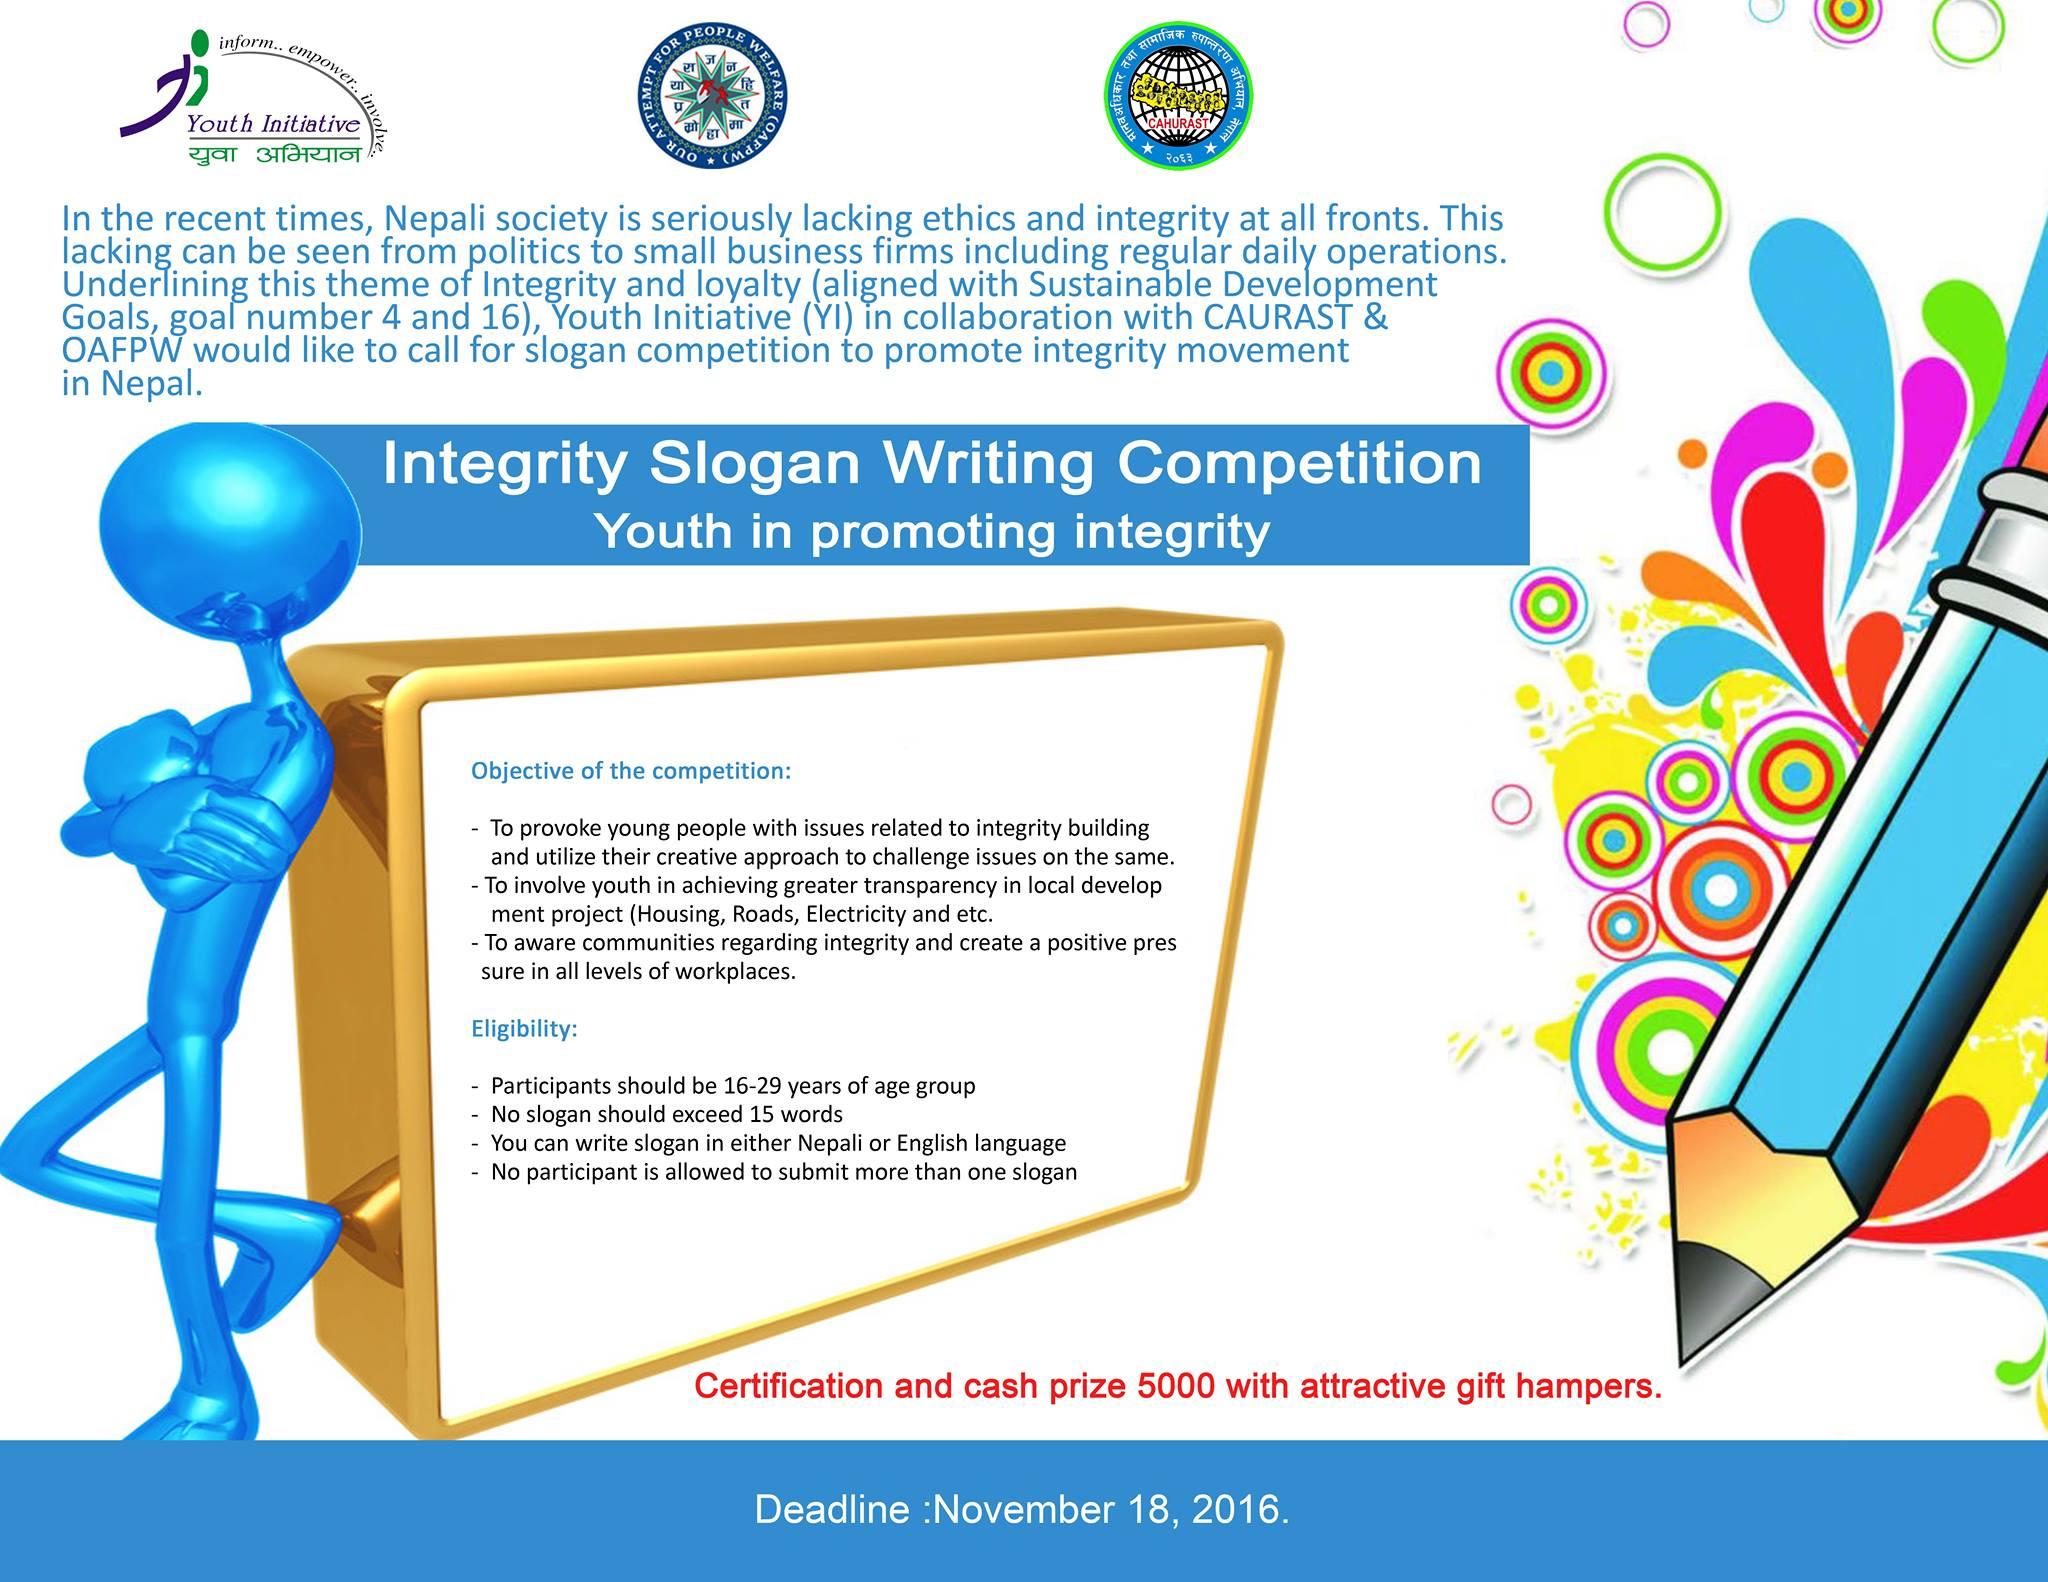 youth-initiative-slogan-writing-competitino | Glocal Khabar